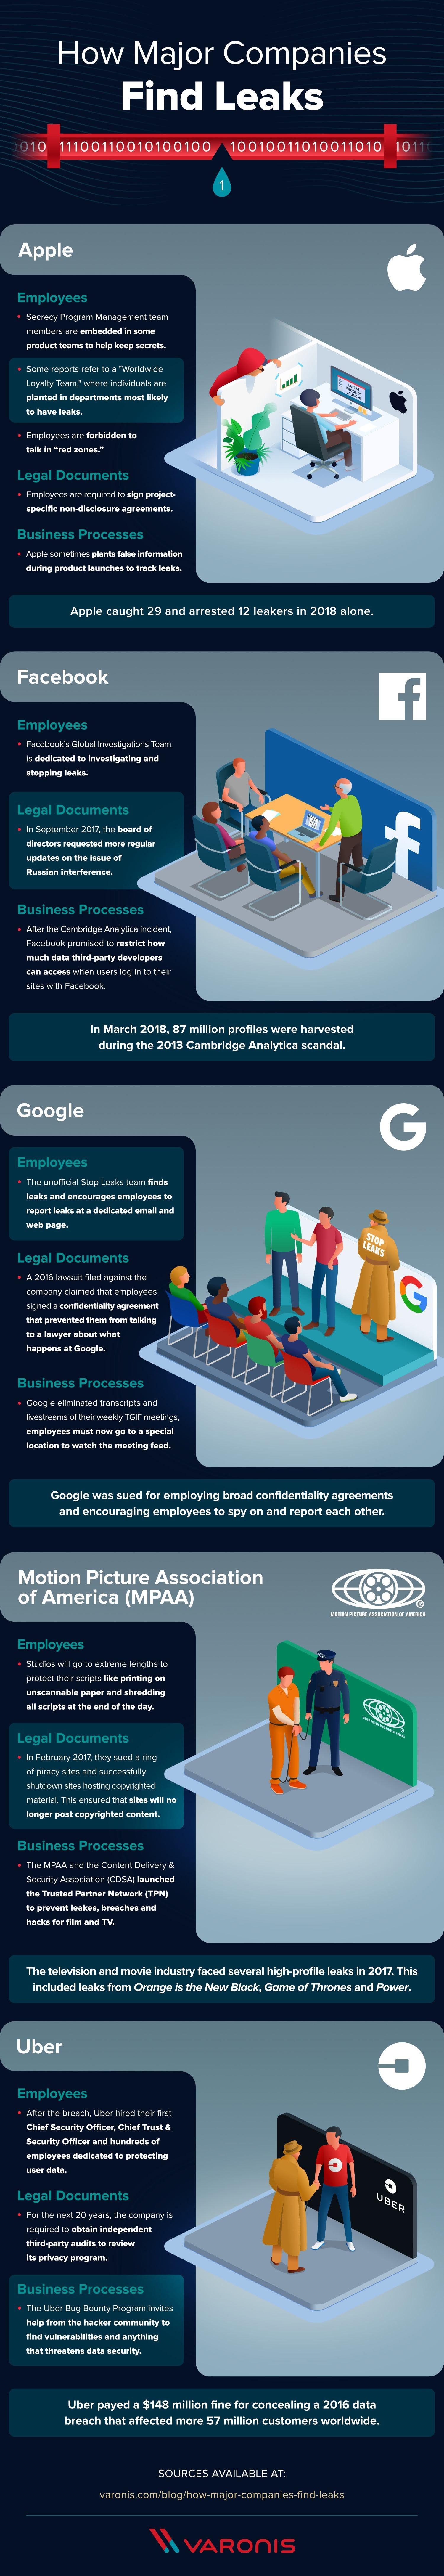 How Major Companies Find Leaks